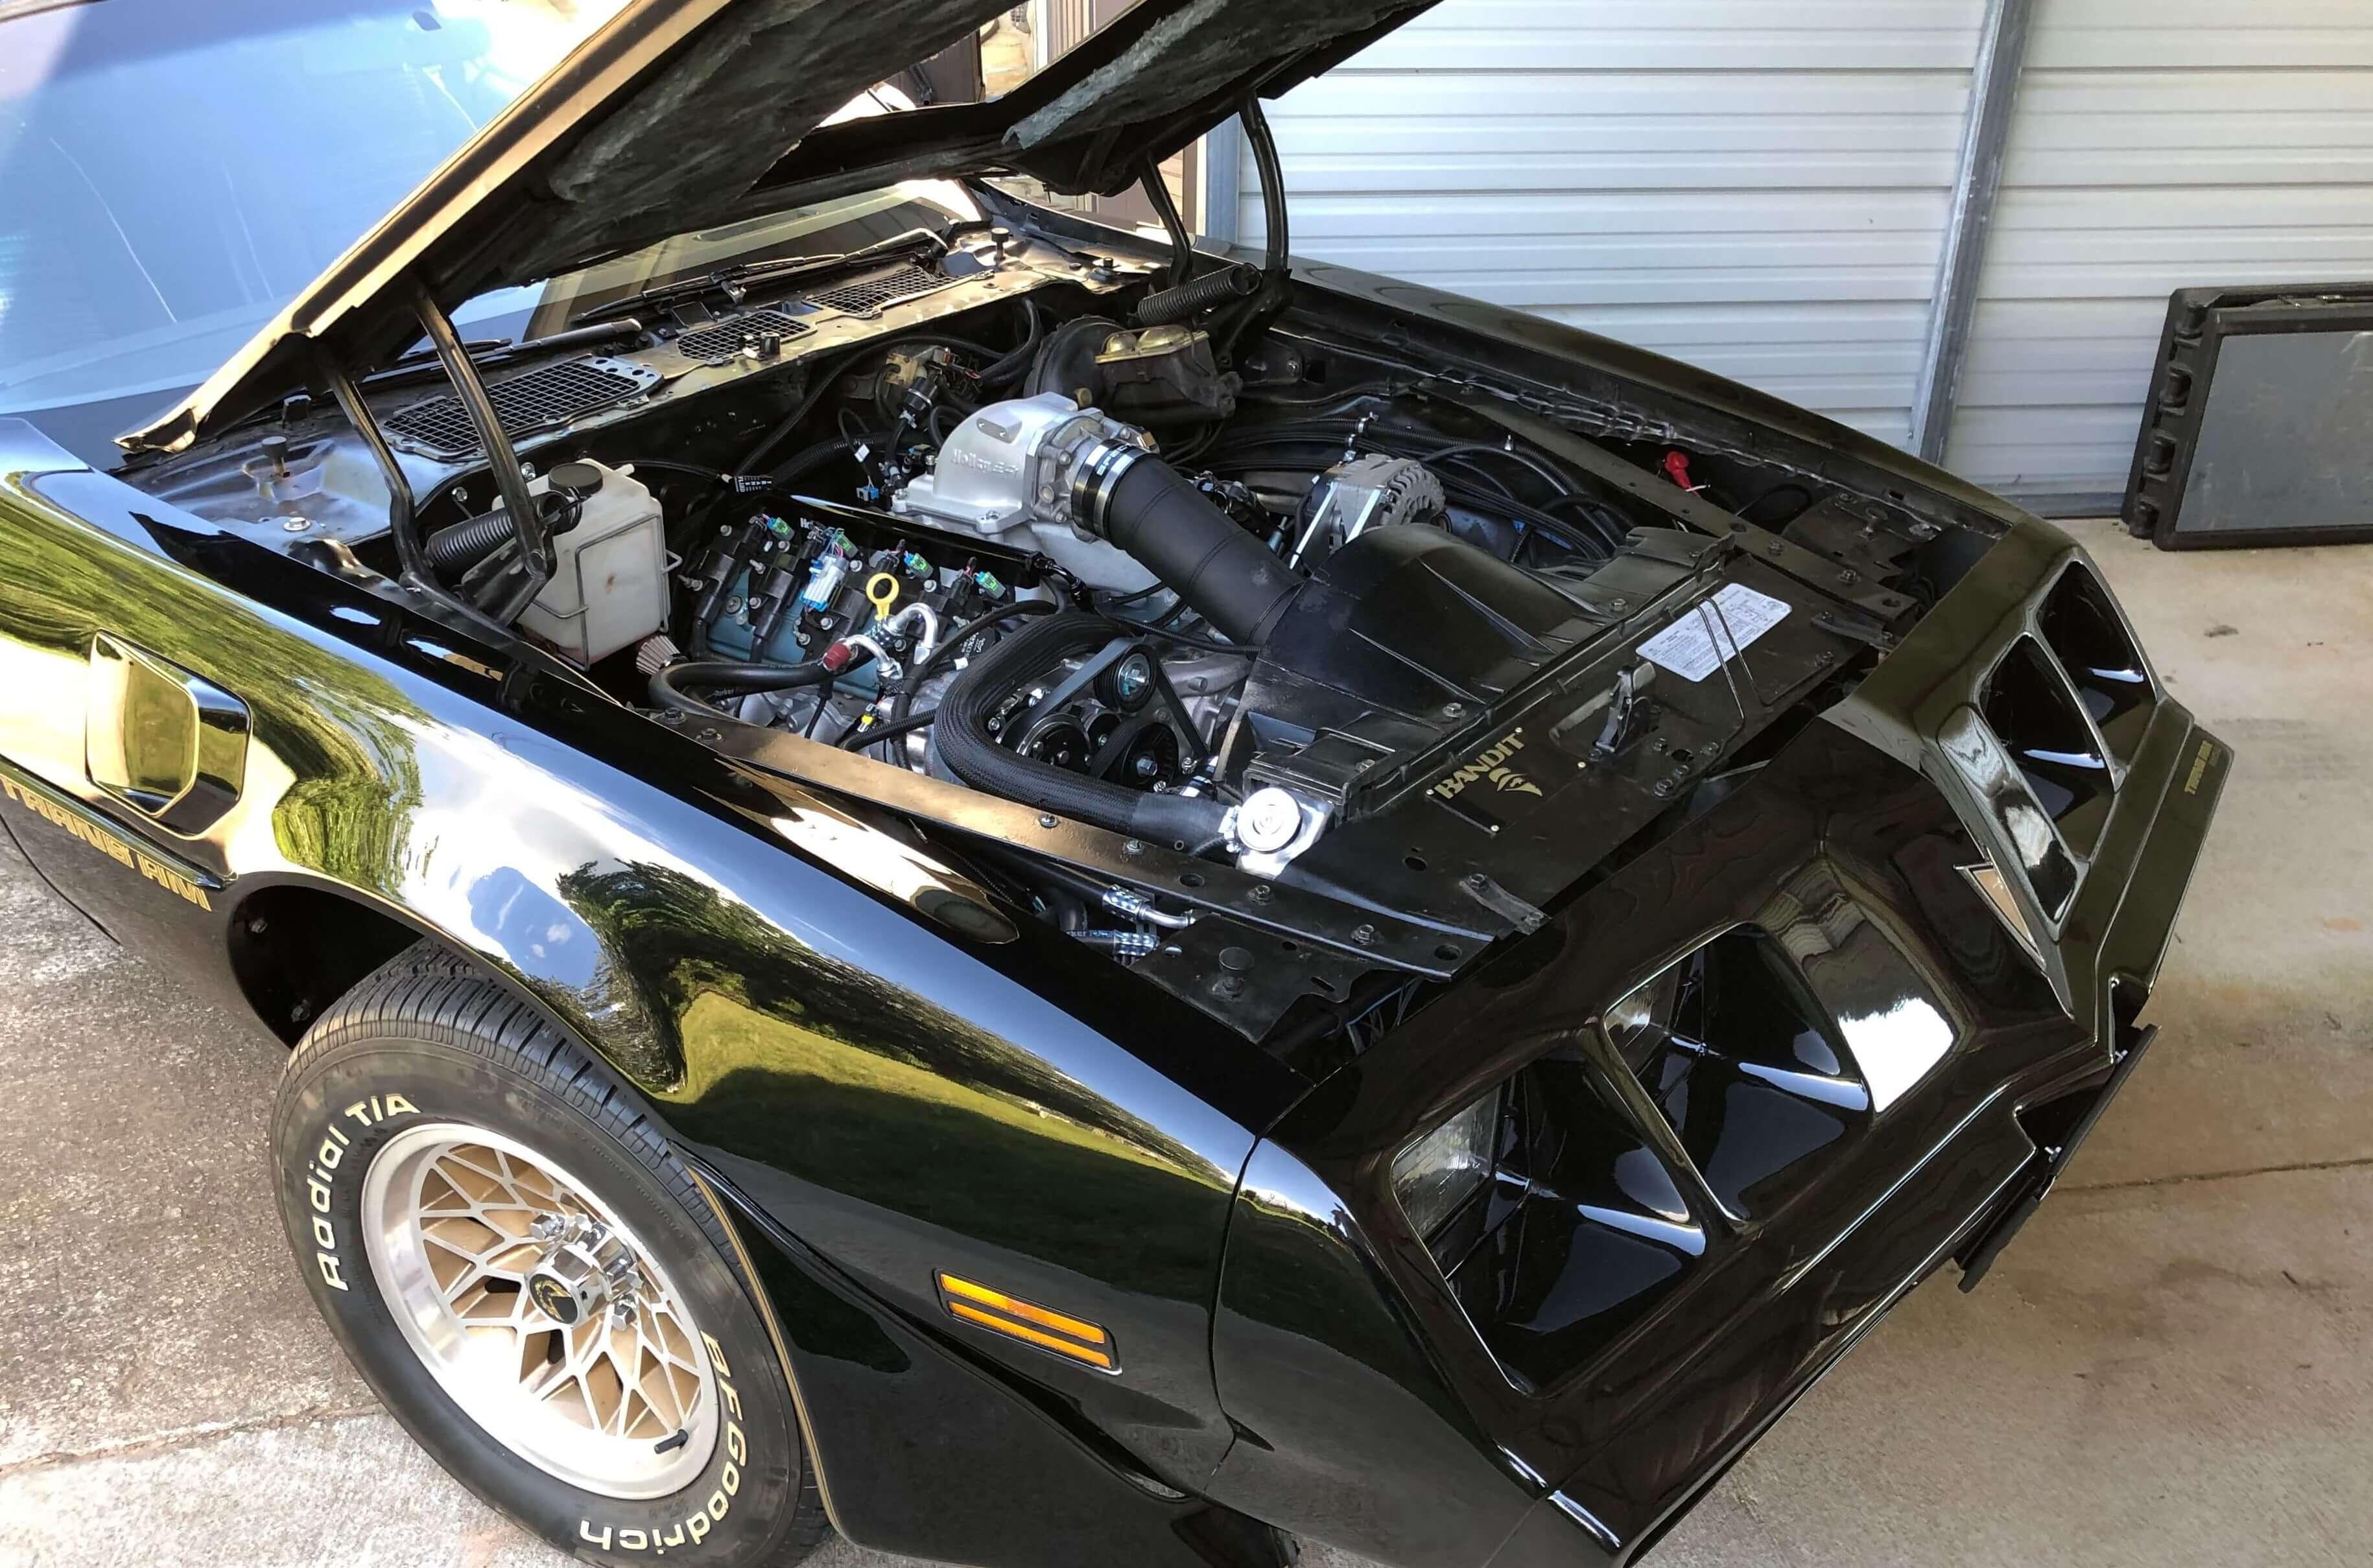 Kevin's 1979 Pontiac Firebird - Holley My Garage